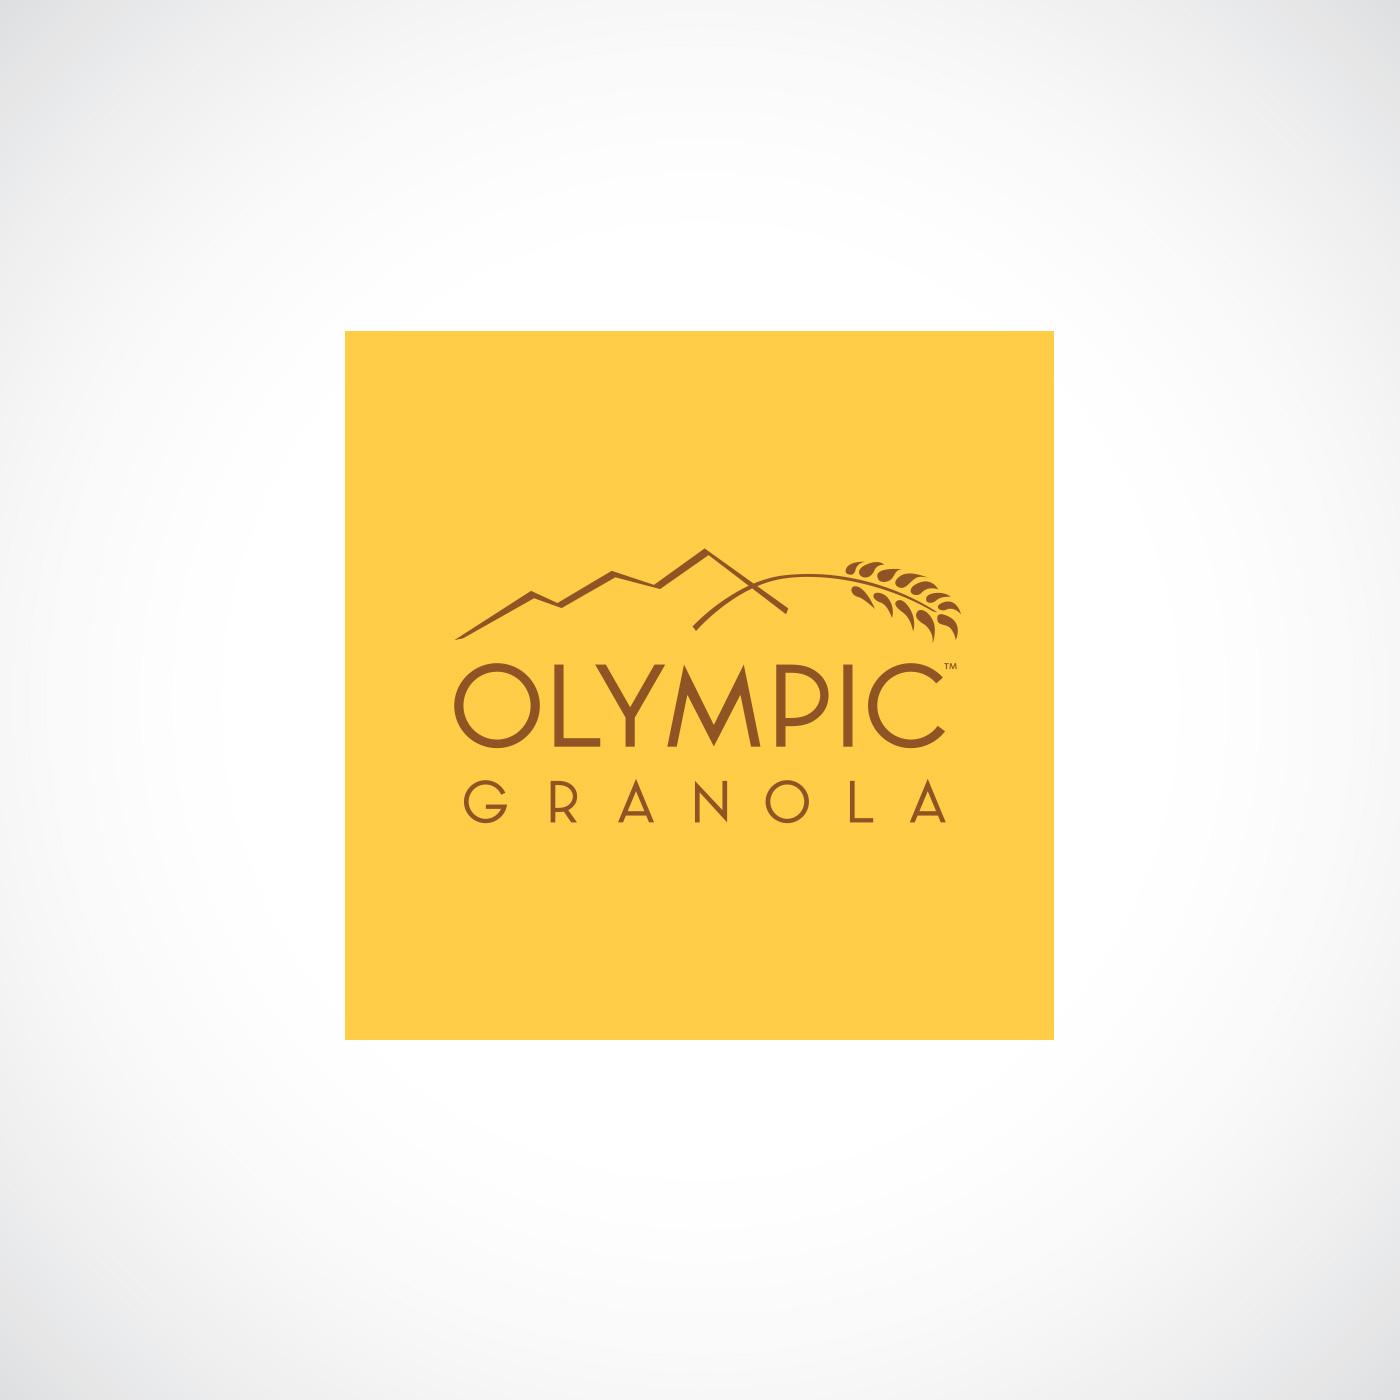 Olympic Granola